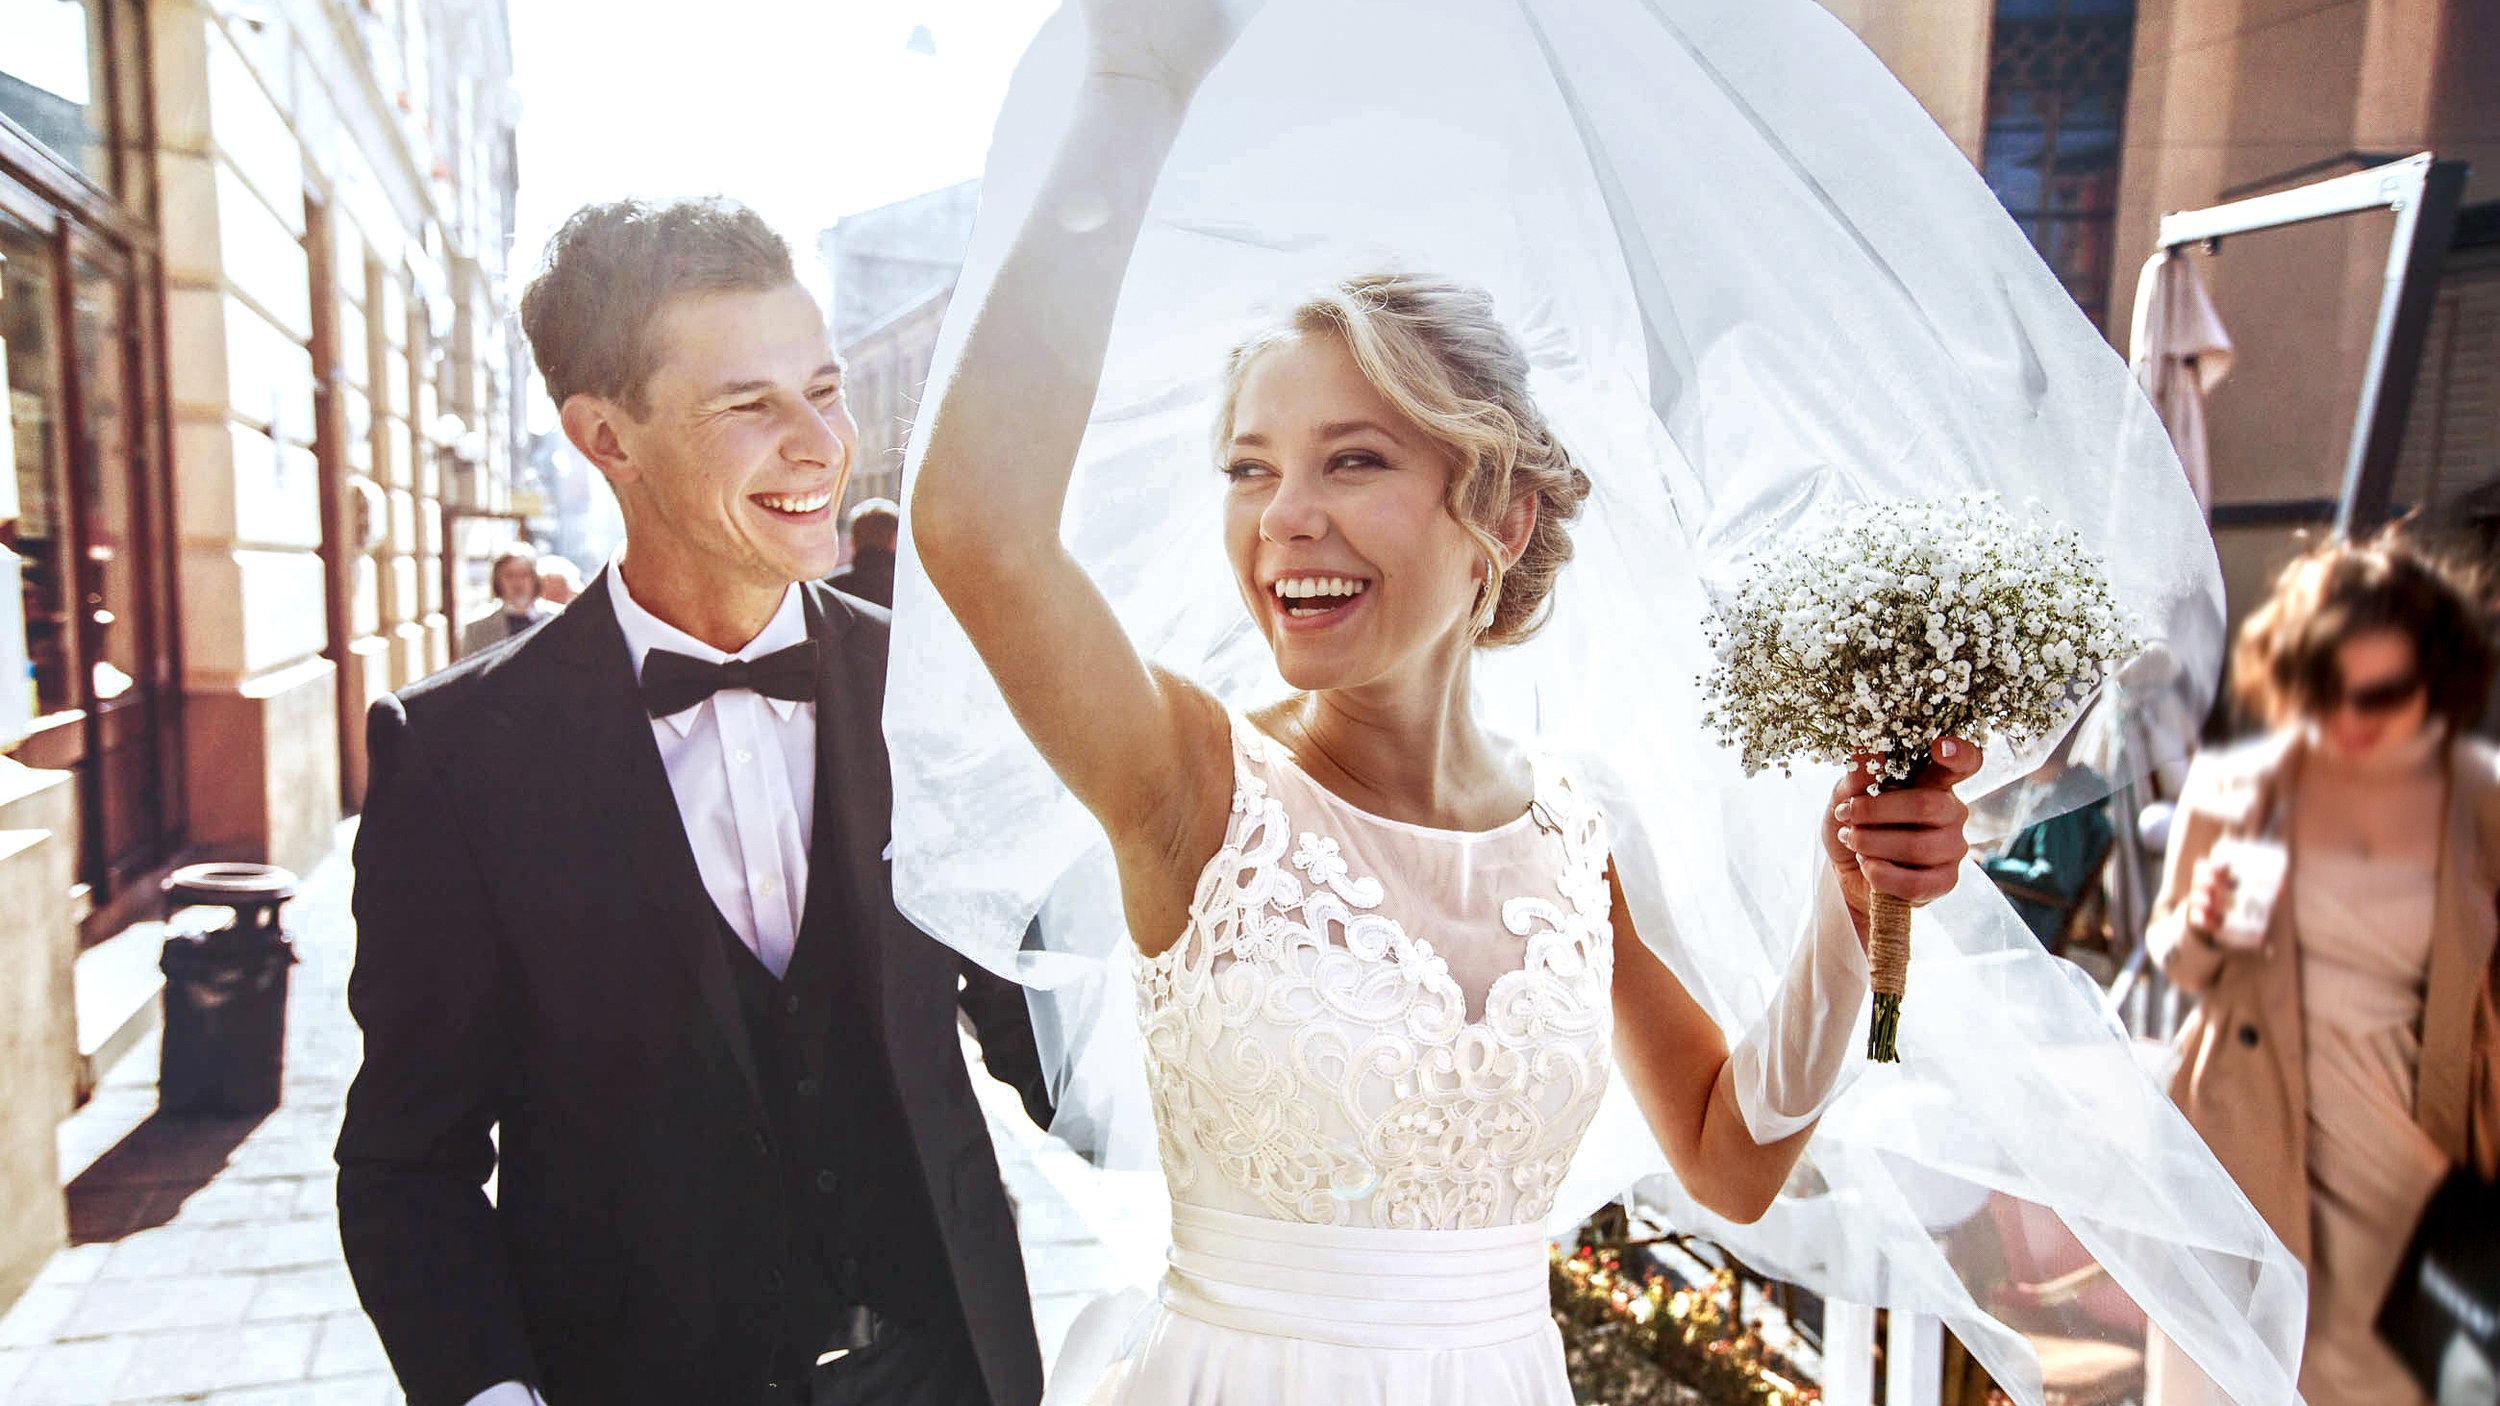 wedding final smile pic.jpg